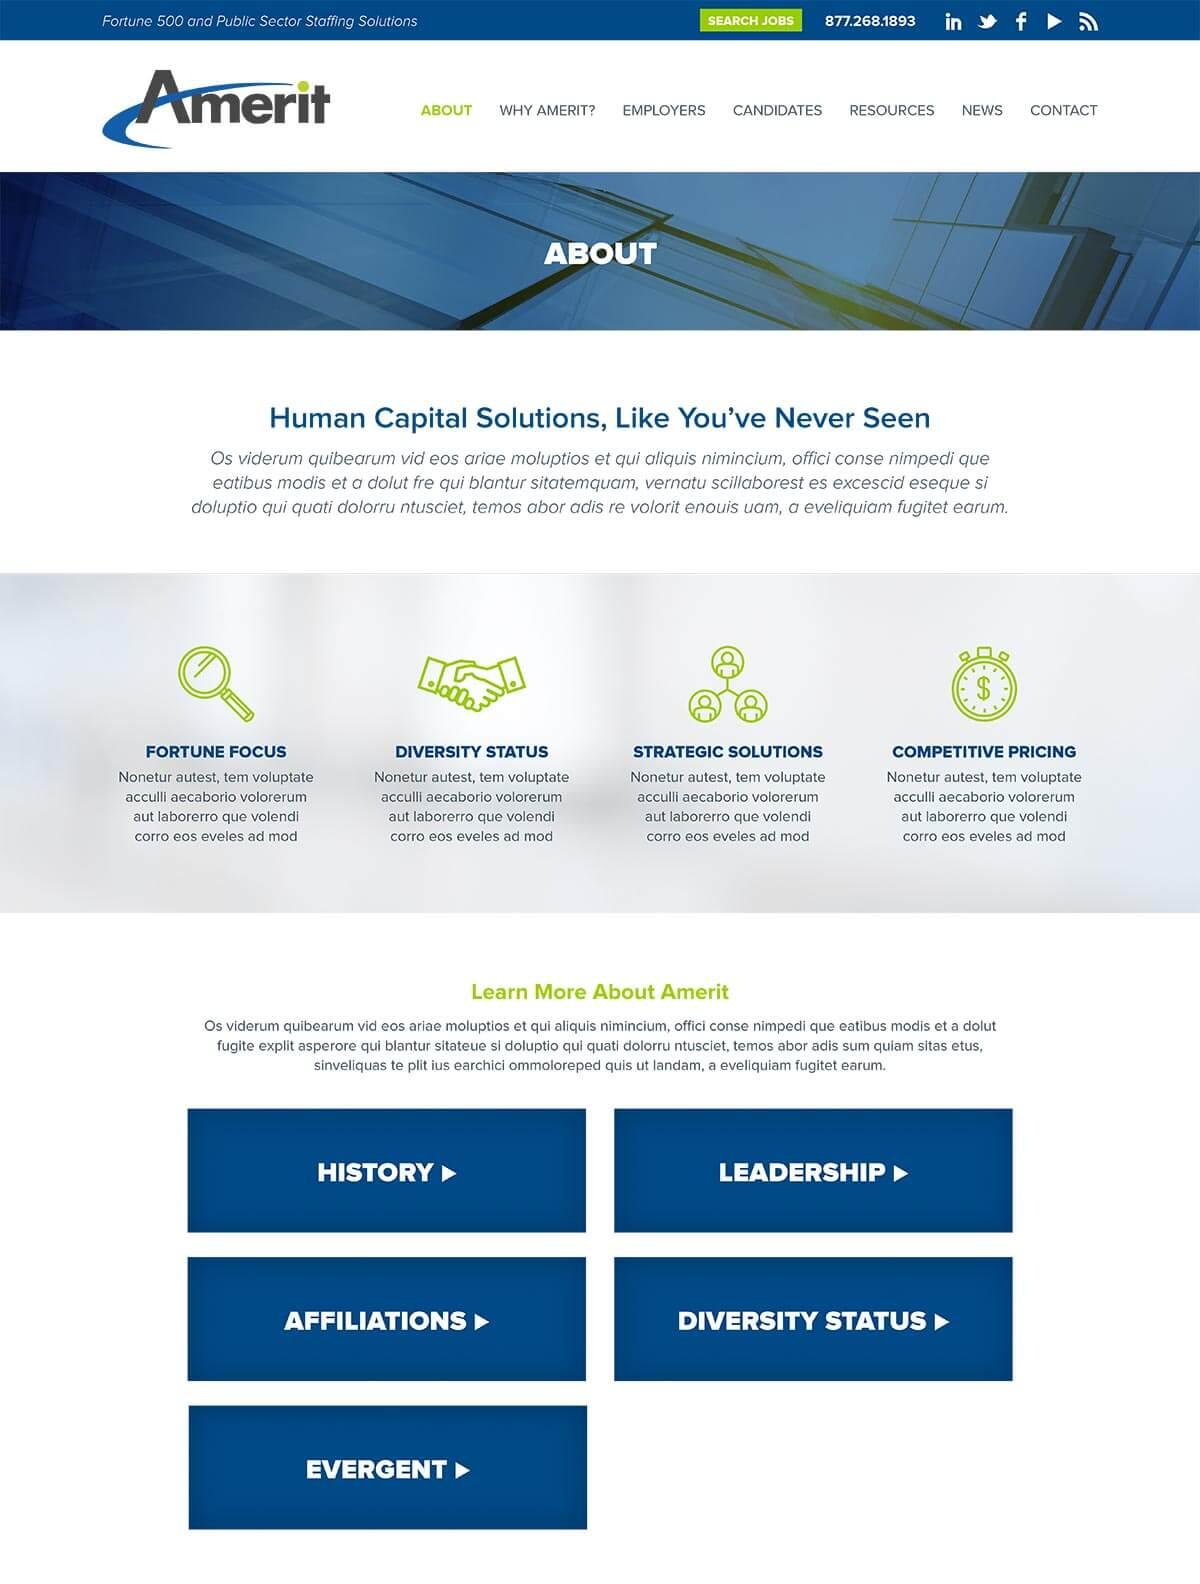 Amerit website about page v1